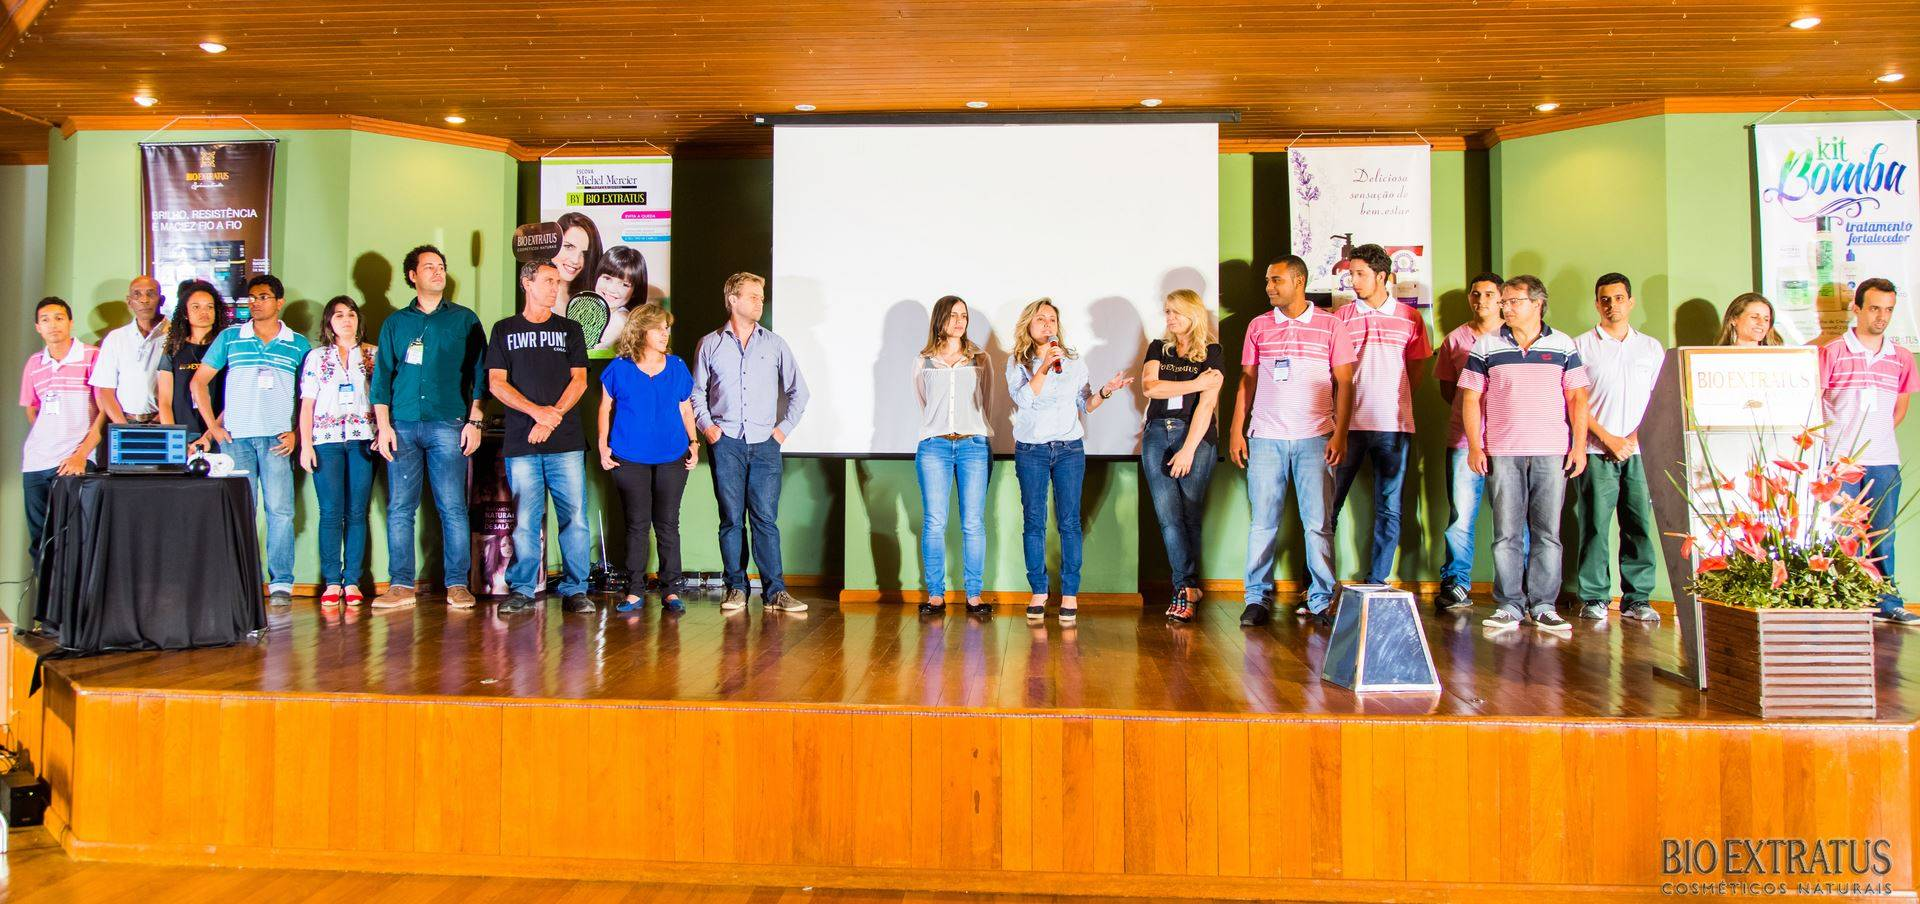 II Workshop - Desenvolvimento do Mix Bio Extratus (140)